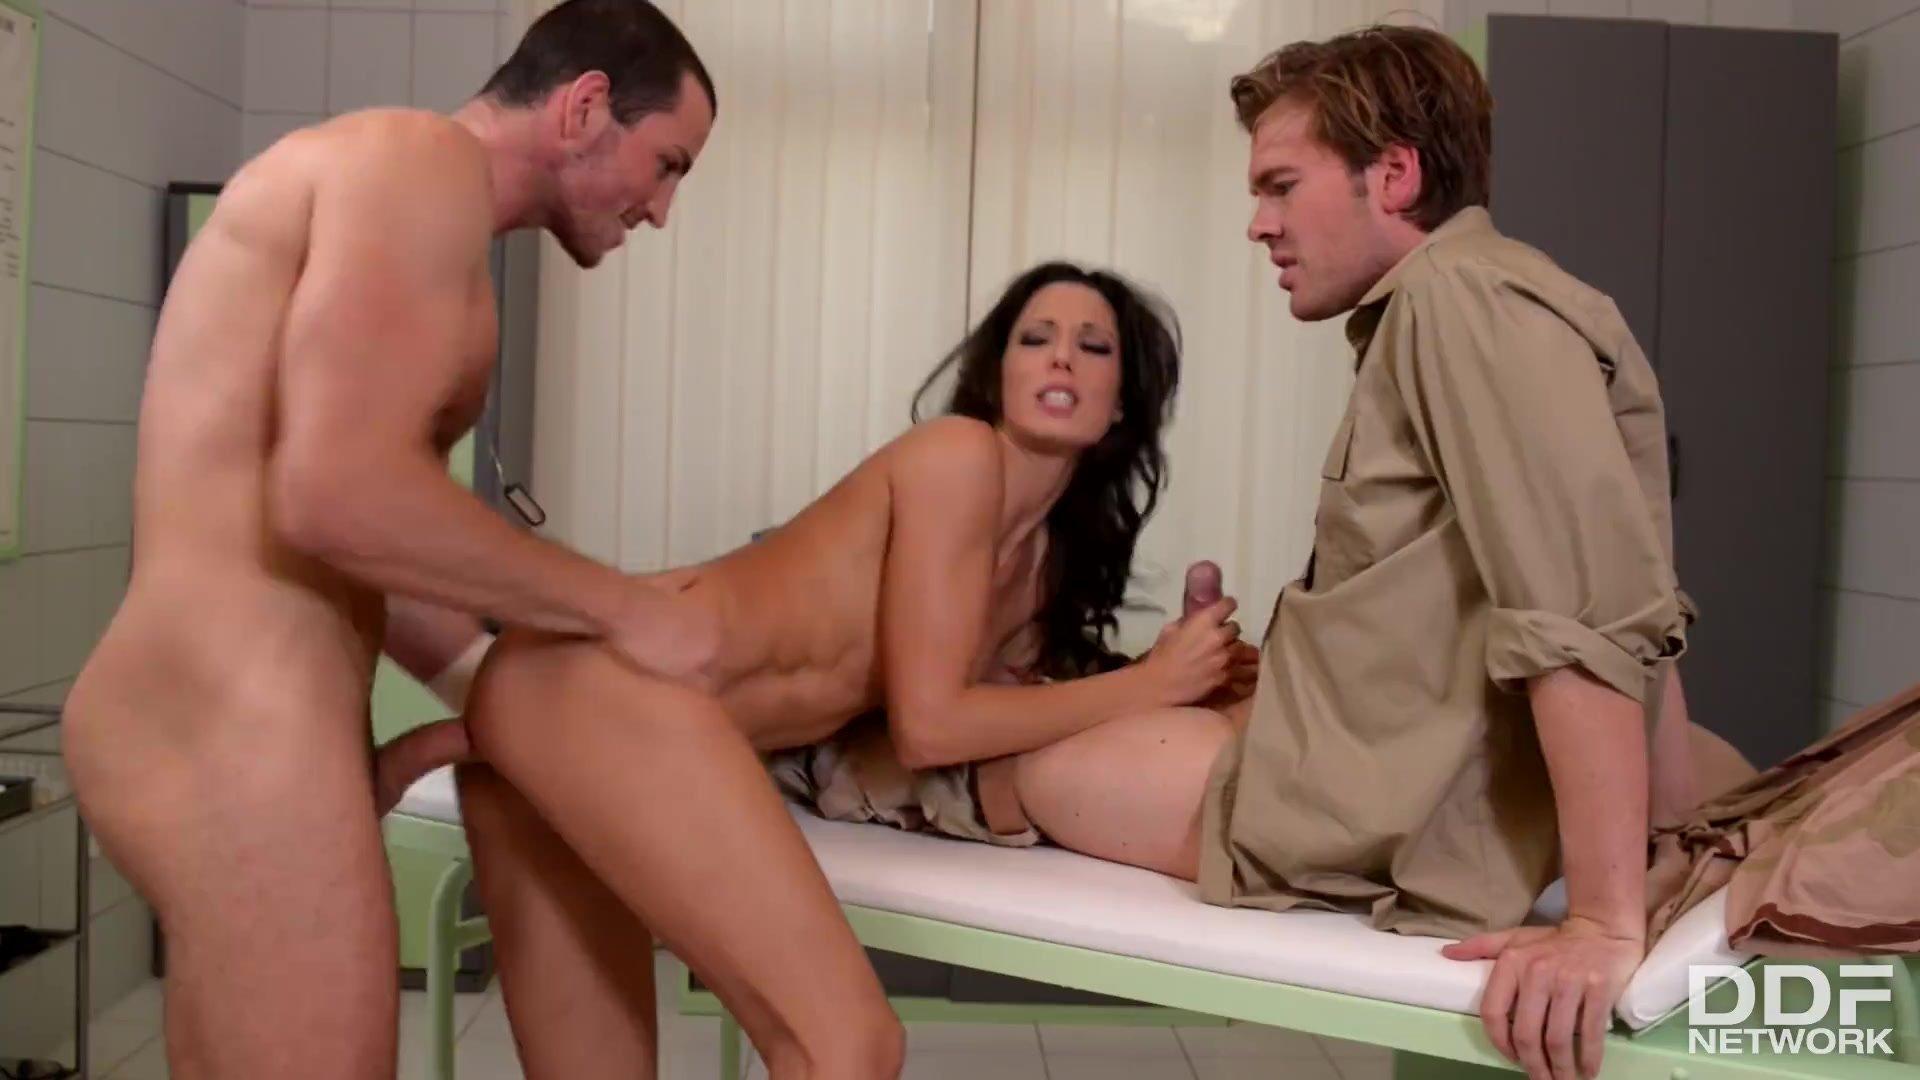 Hardcore anal sex threesome with Nurse Alexa Tomas's horny holes stretched